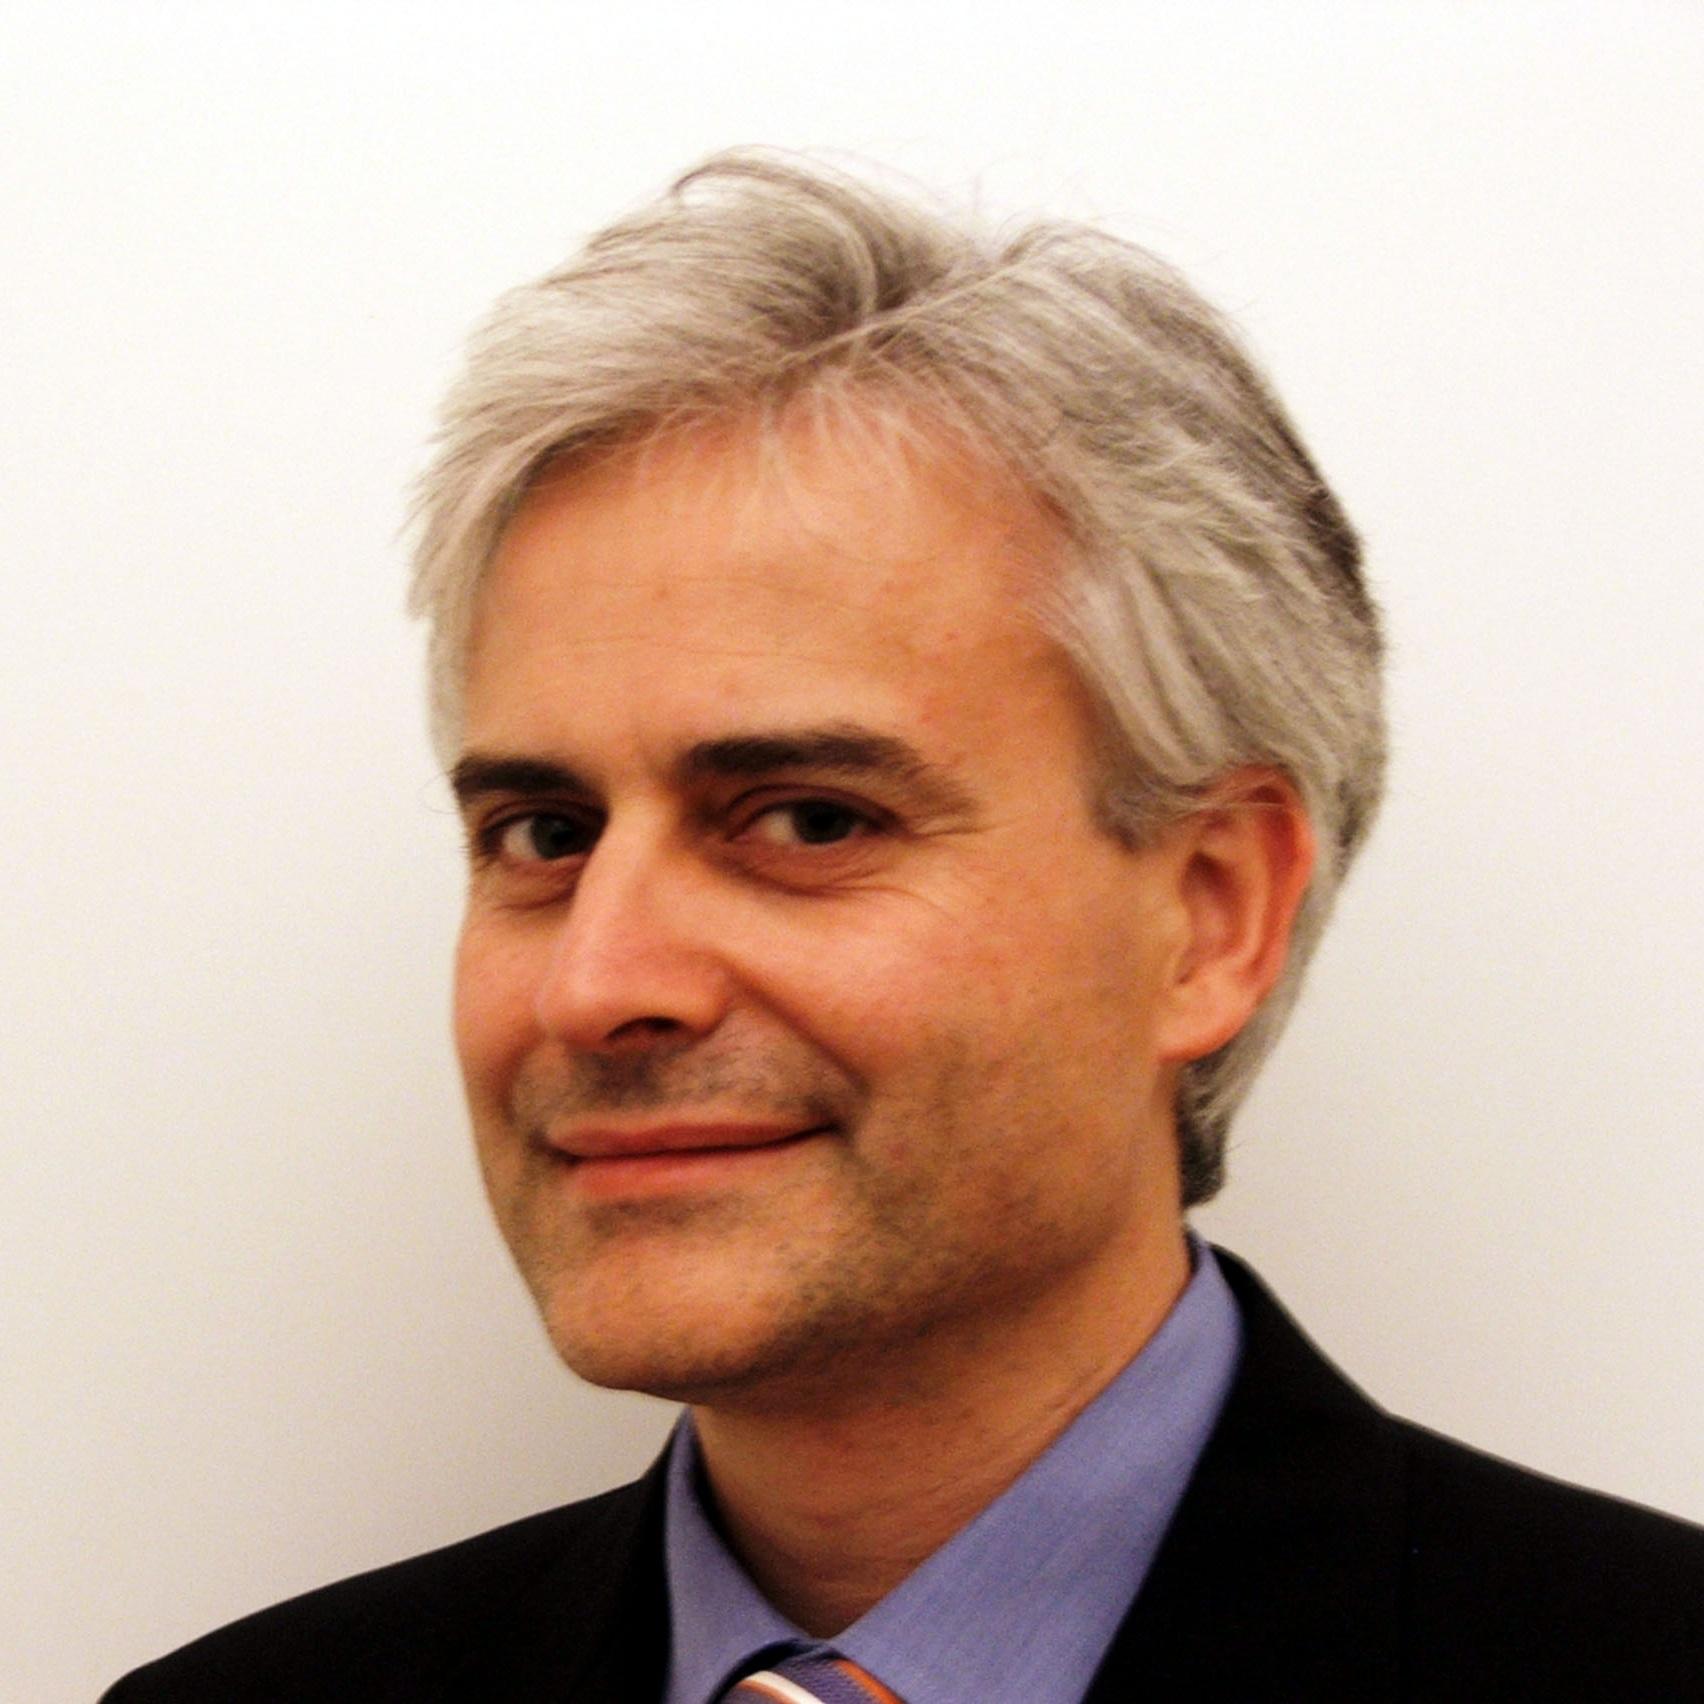 francesco marcelloni - business intelligence professor, unipi